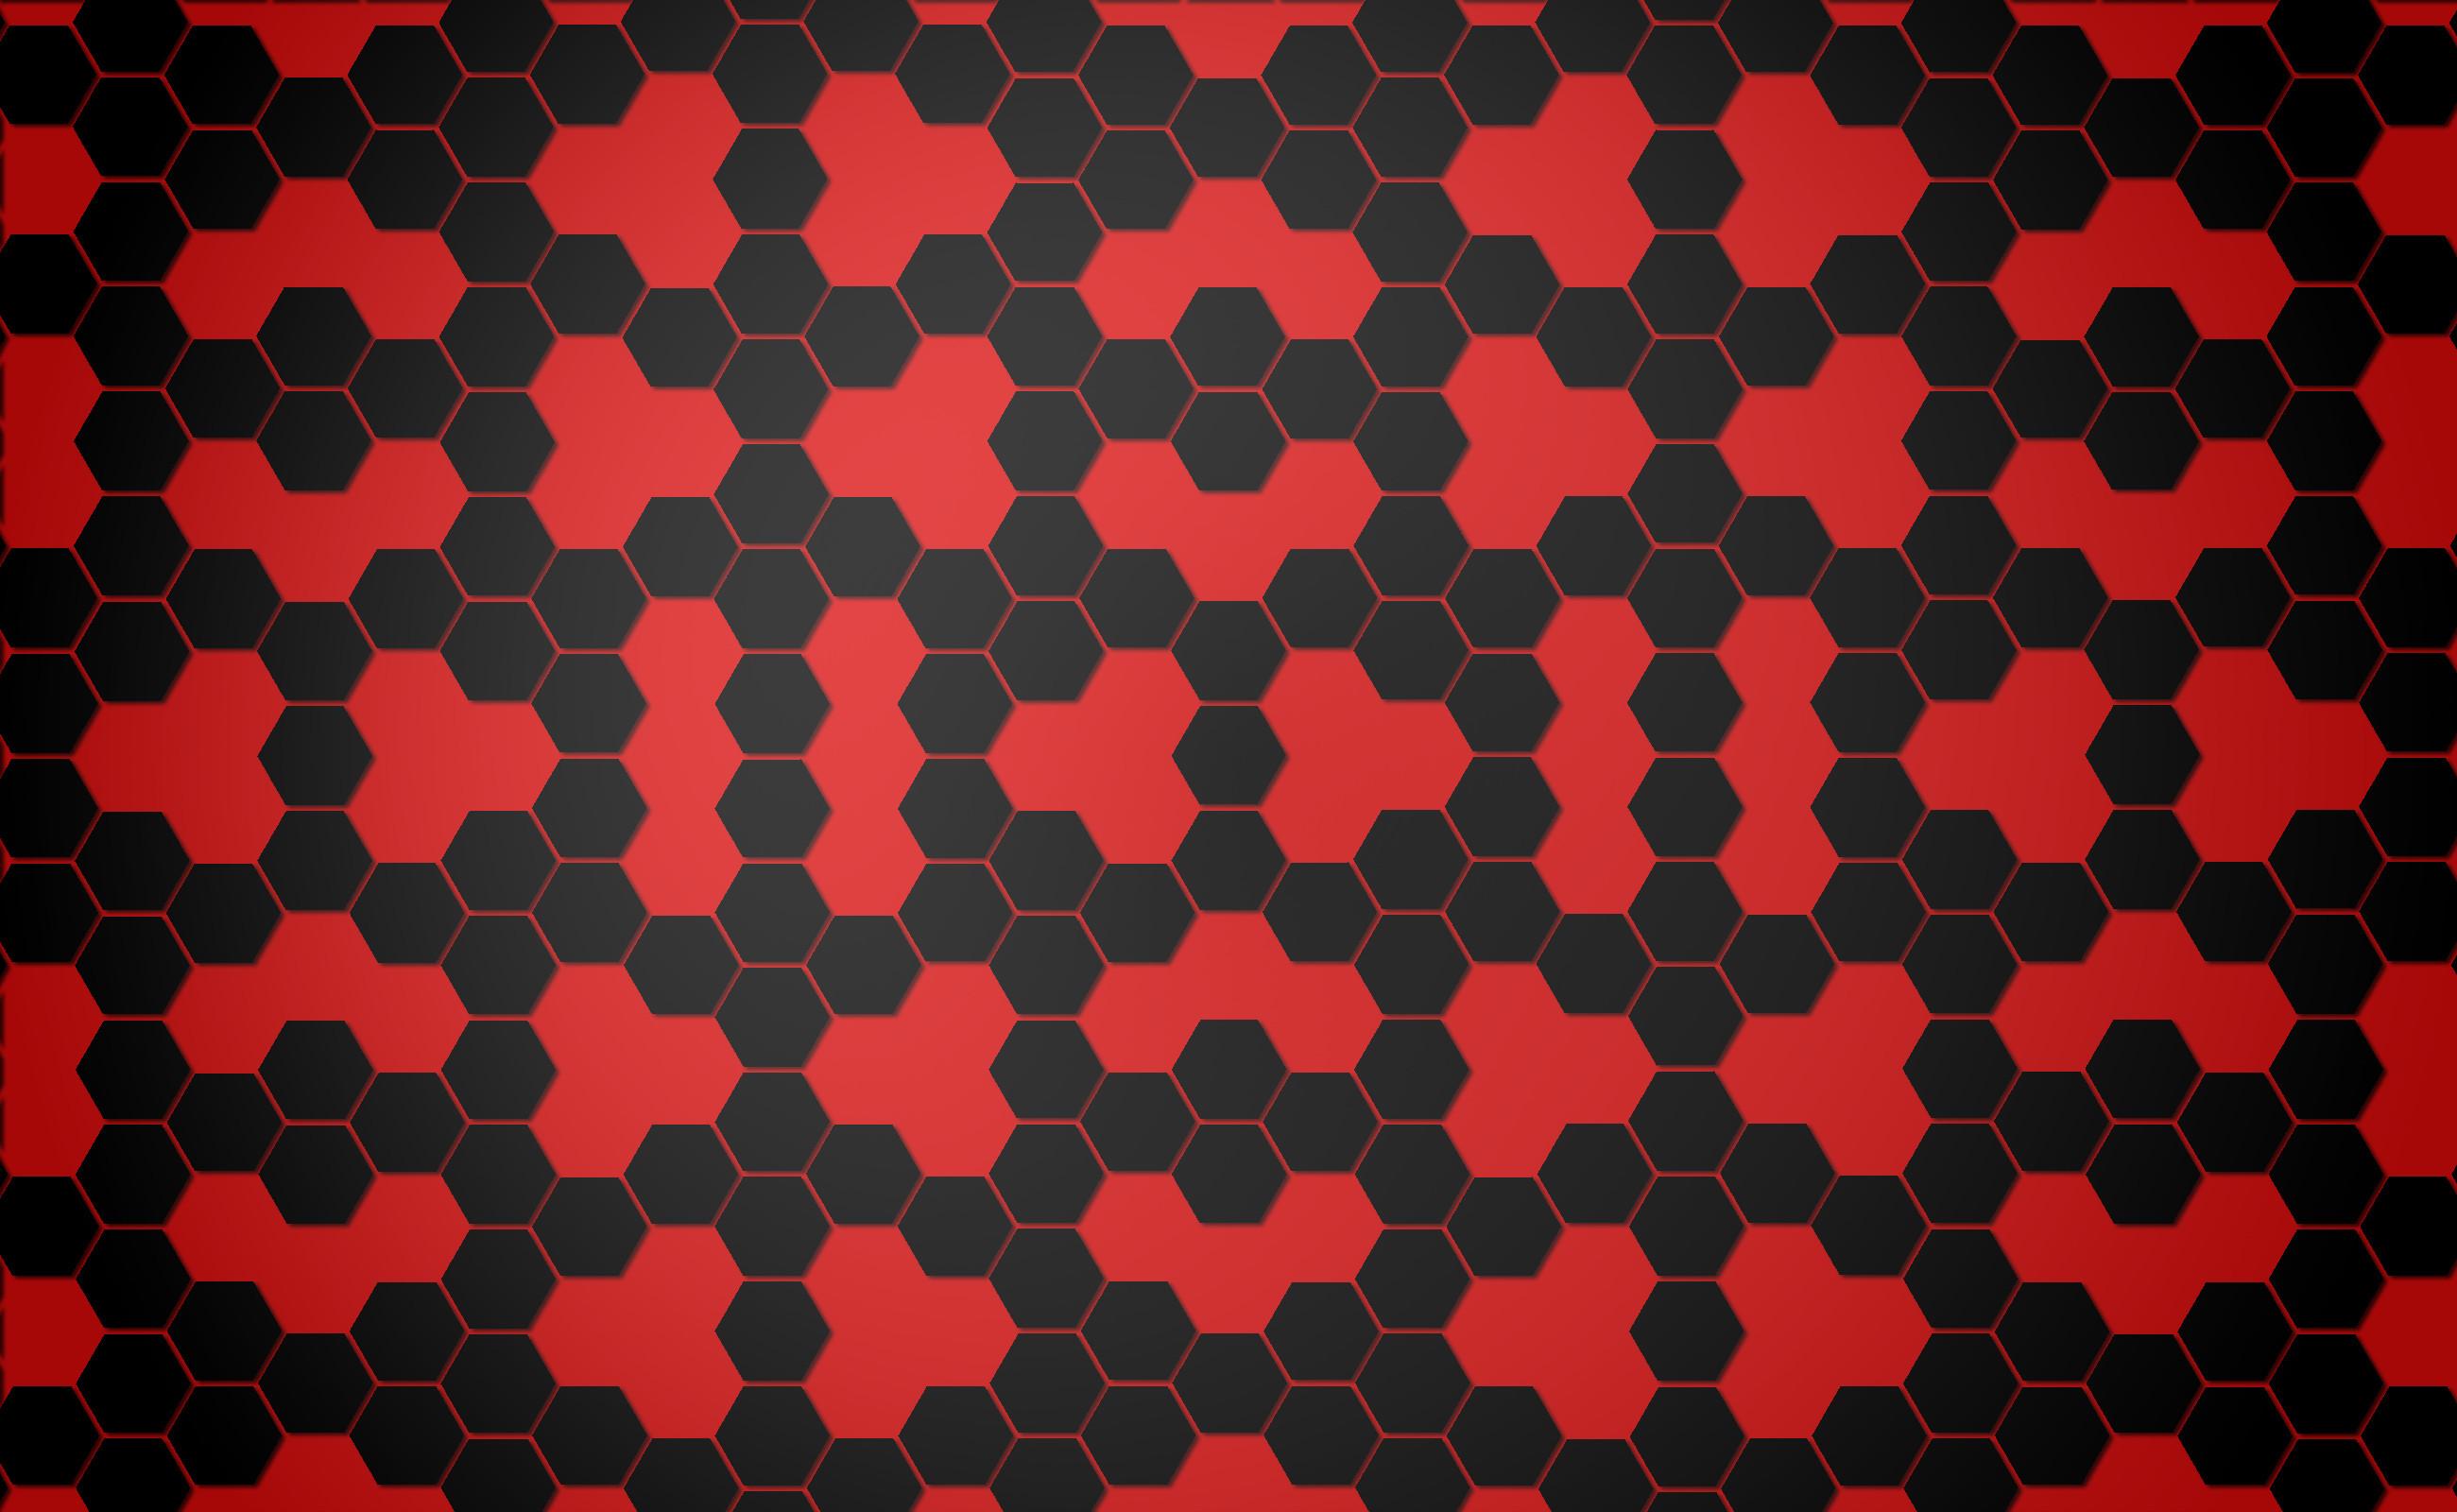 Cool Wallpaper Halloween Polka Dot - 671625-large-red-hex-wallpaper-2600x1600-images  2018_671359.jpg